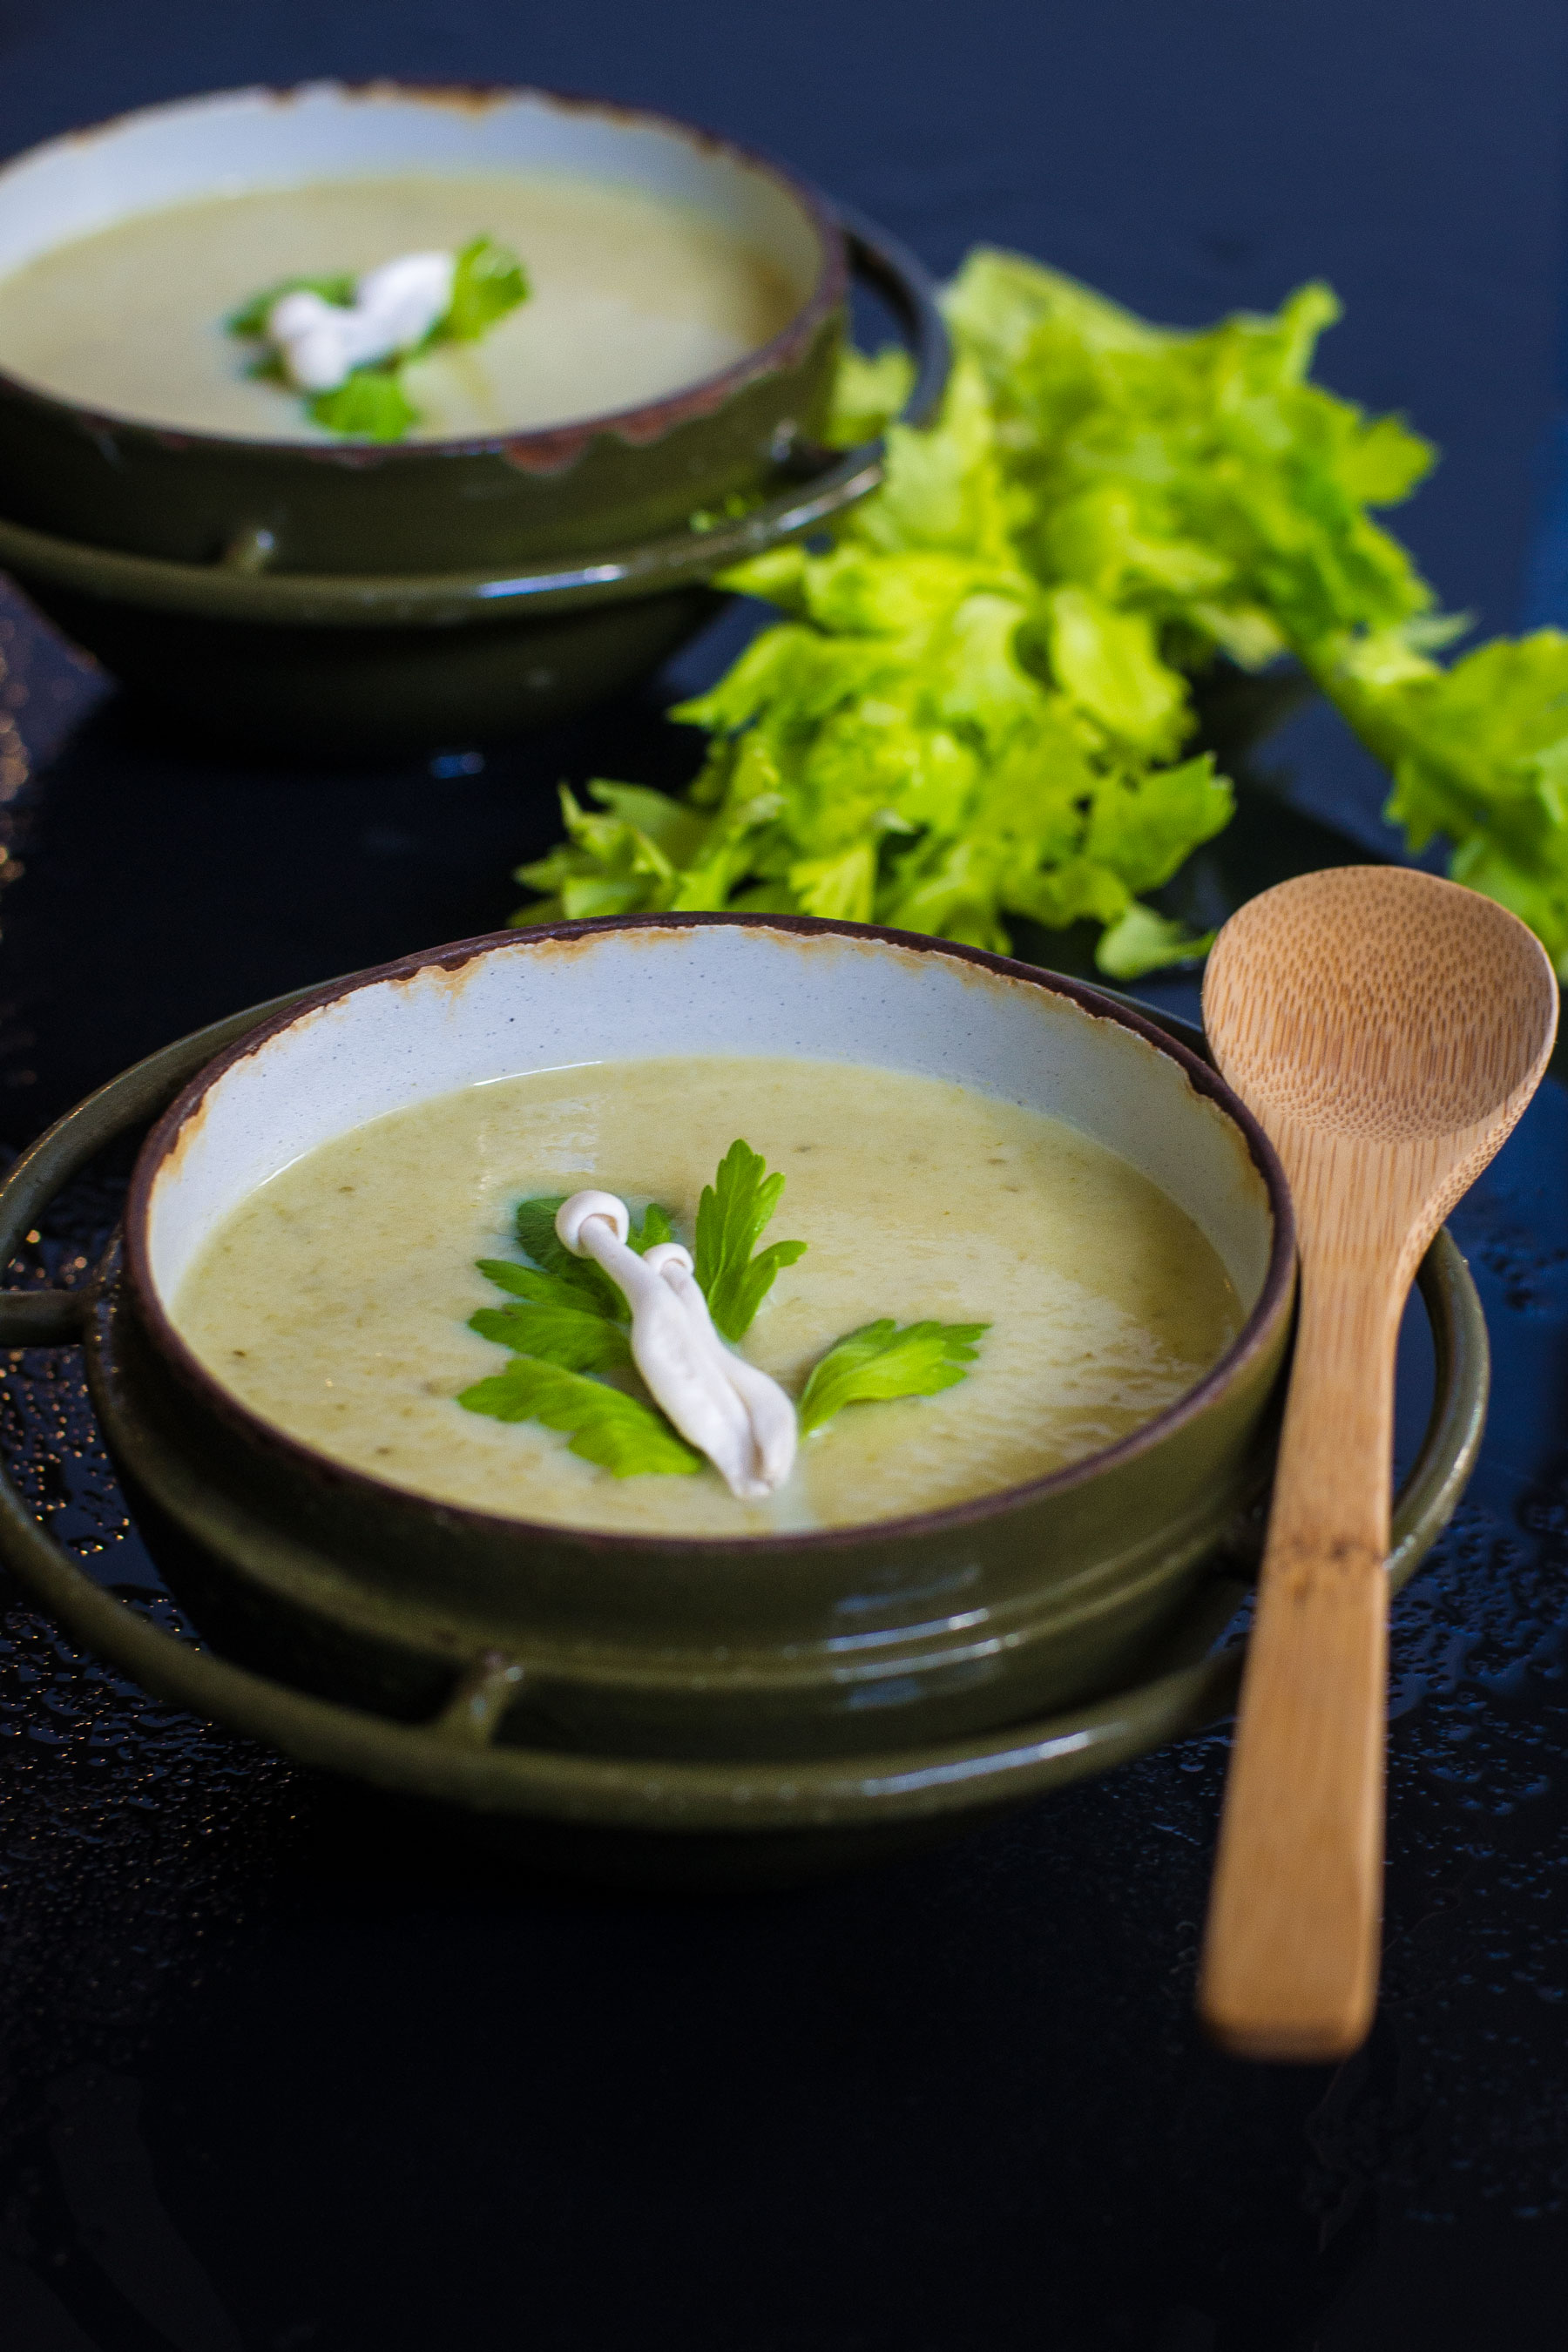 Creamy Celery Leek Soup by Sam Henderson of Today's Nest